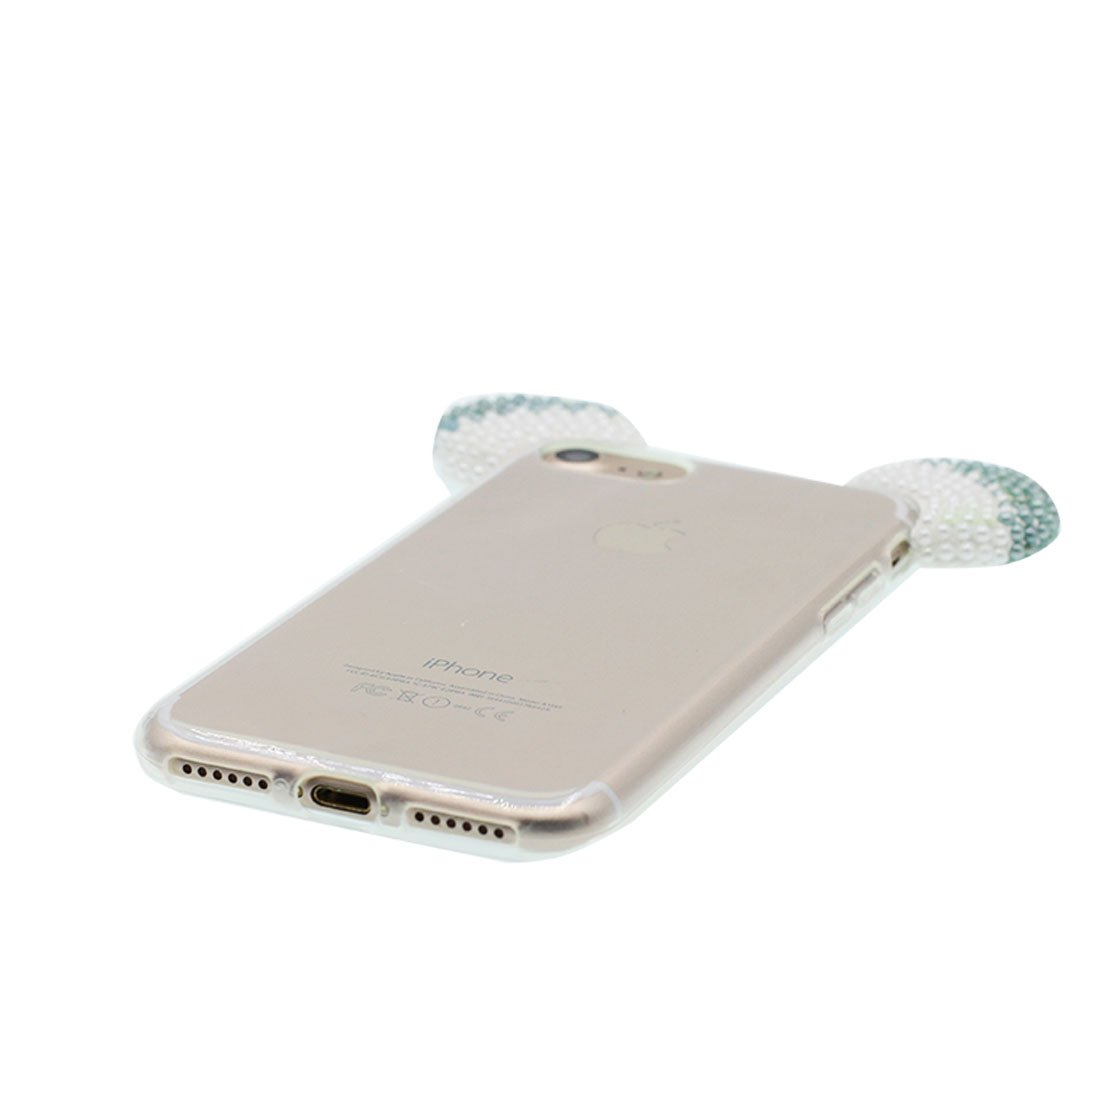 d0f62c98df5 iPhone 6 Plus/6s Plus funda 5.5 iPhone 6S Plus Carcasa Lujo Bling Glitter  Diamond funda de silicona ...